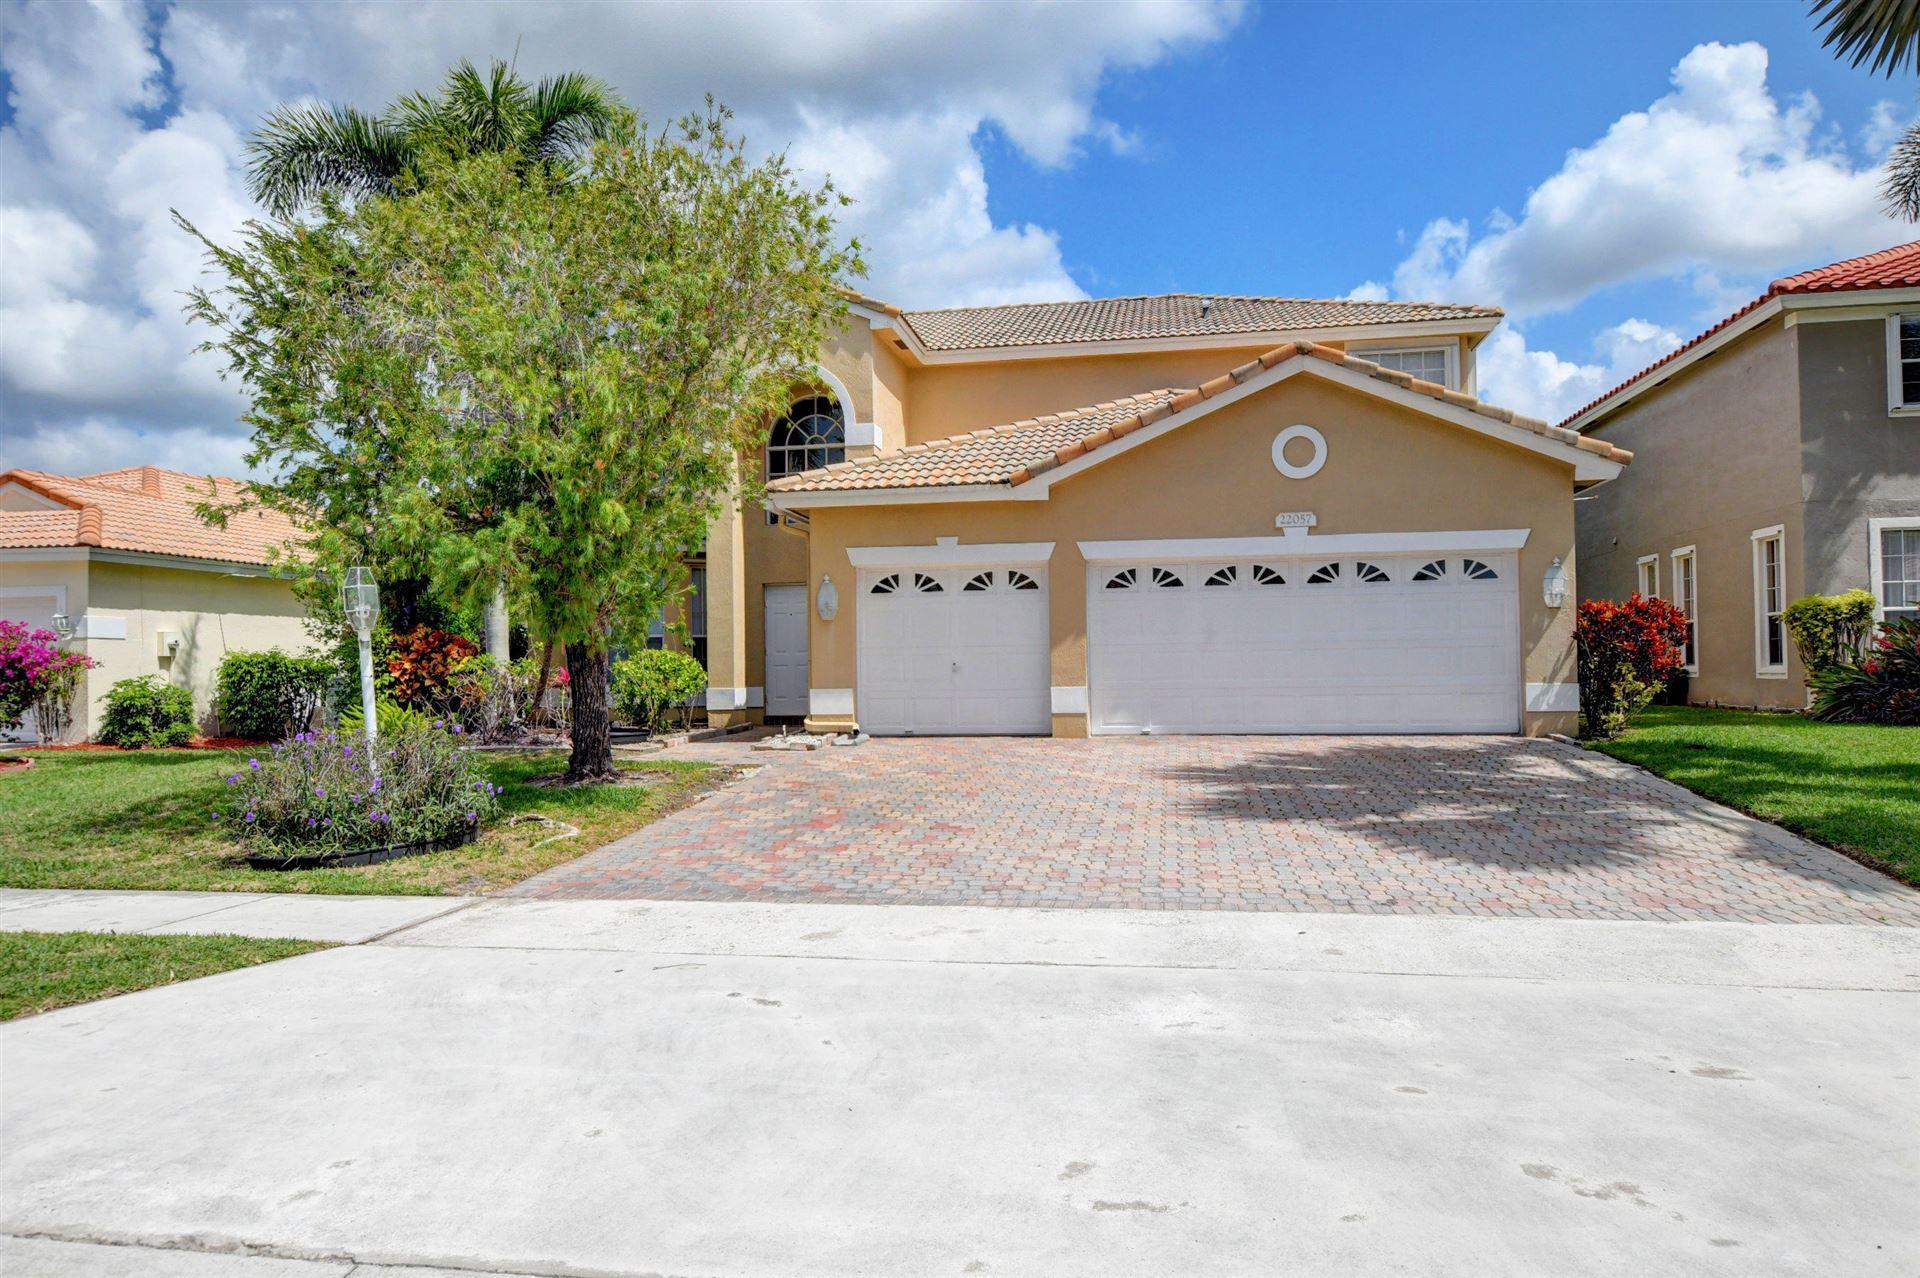 22057 Palm Grass Drive, Boca Raton, FL 33428 - MLS#: RX-10713121